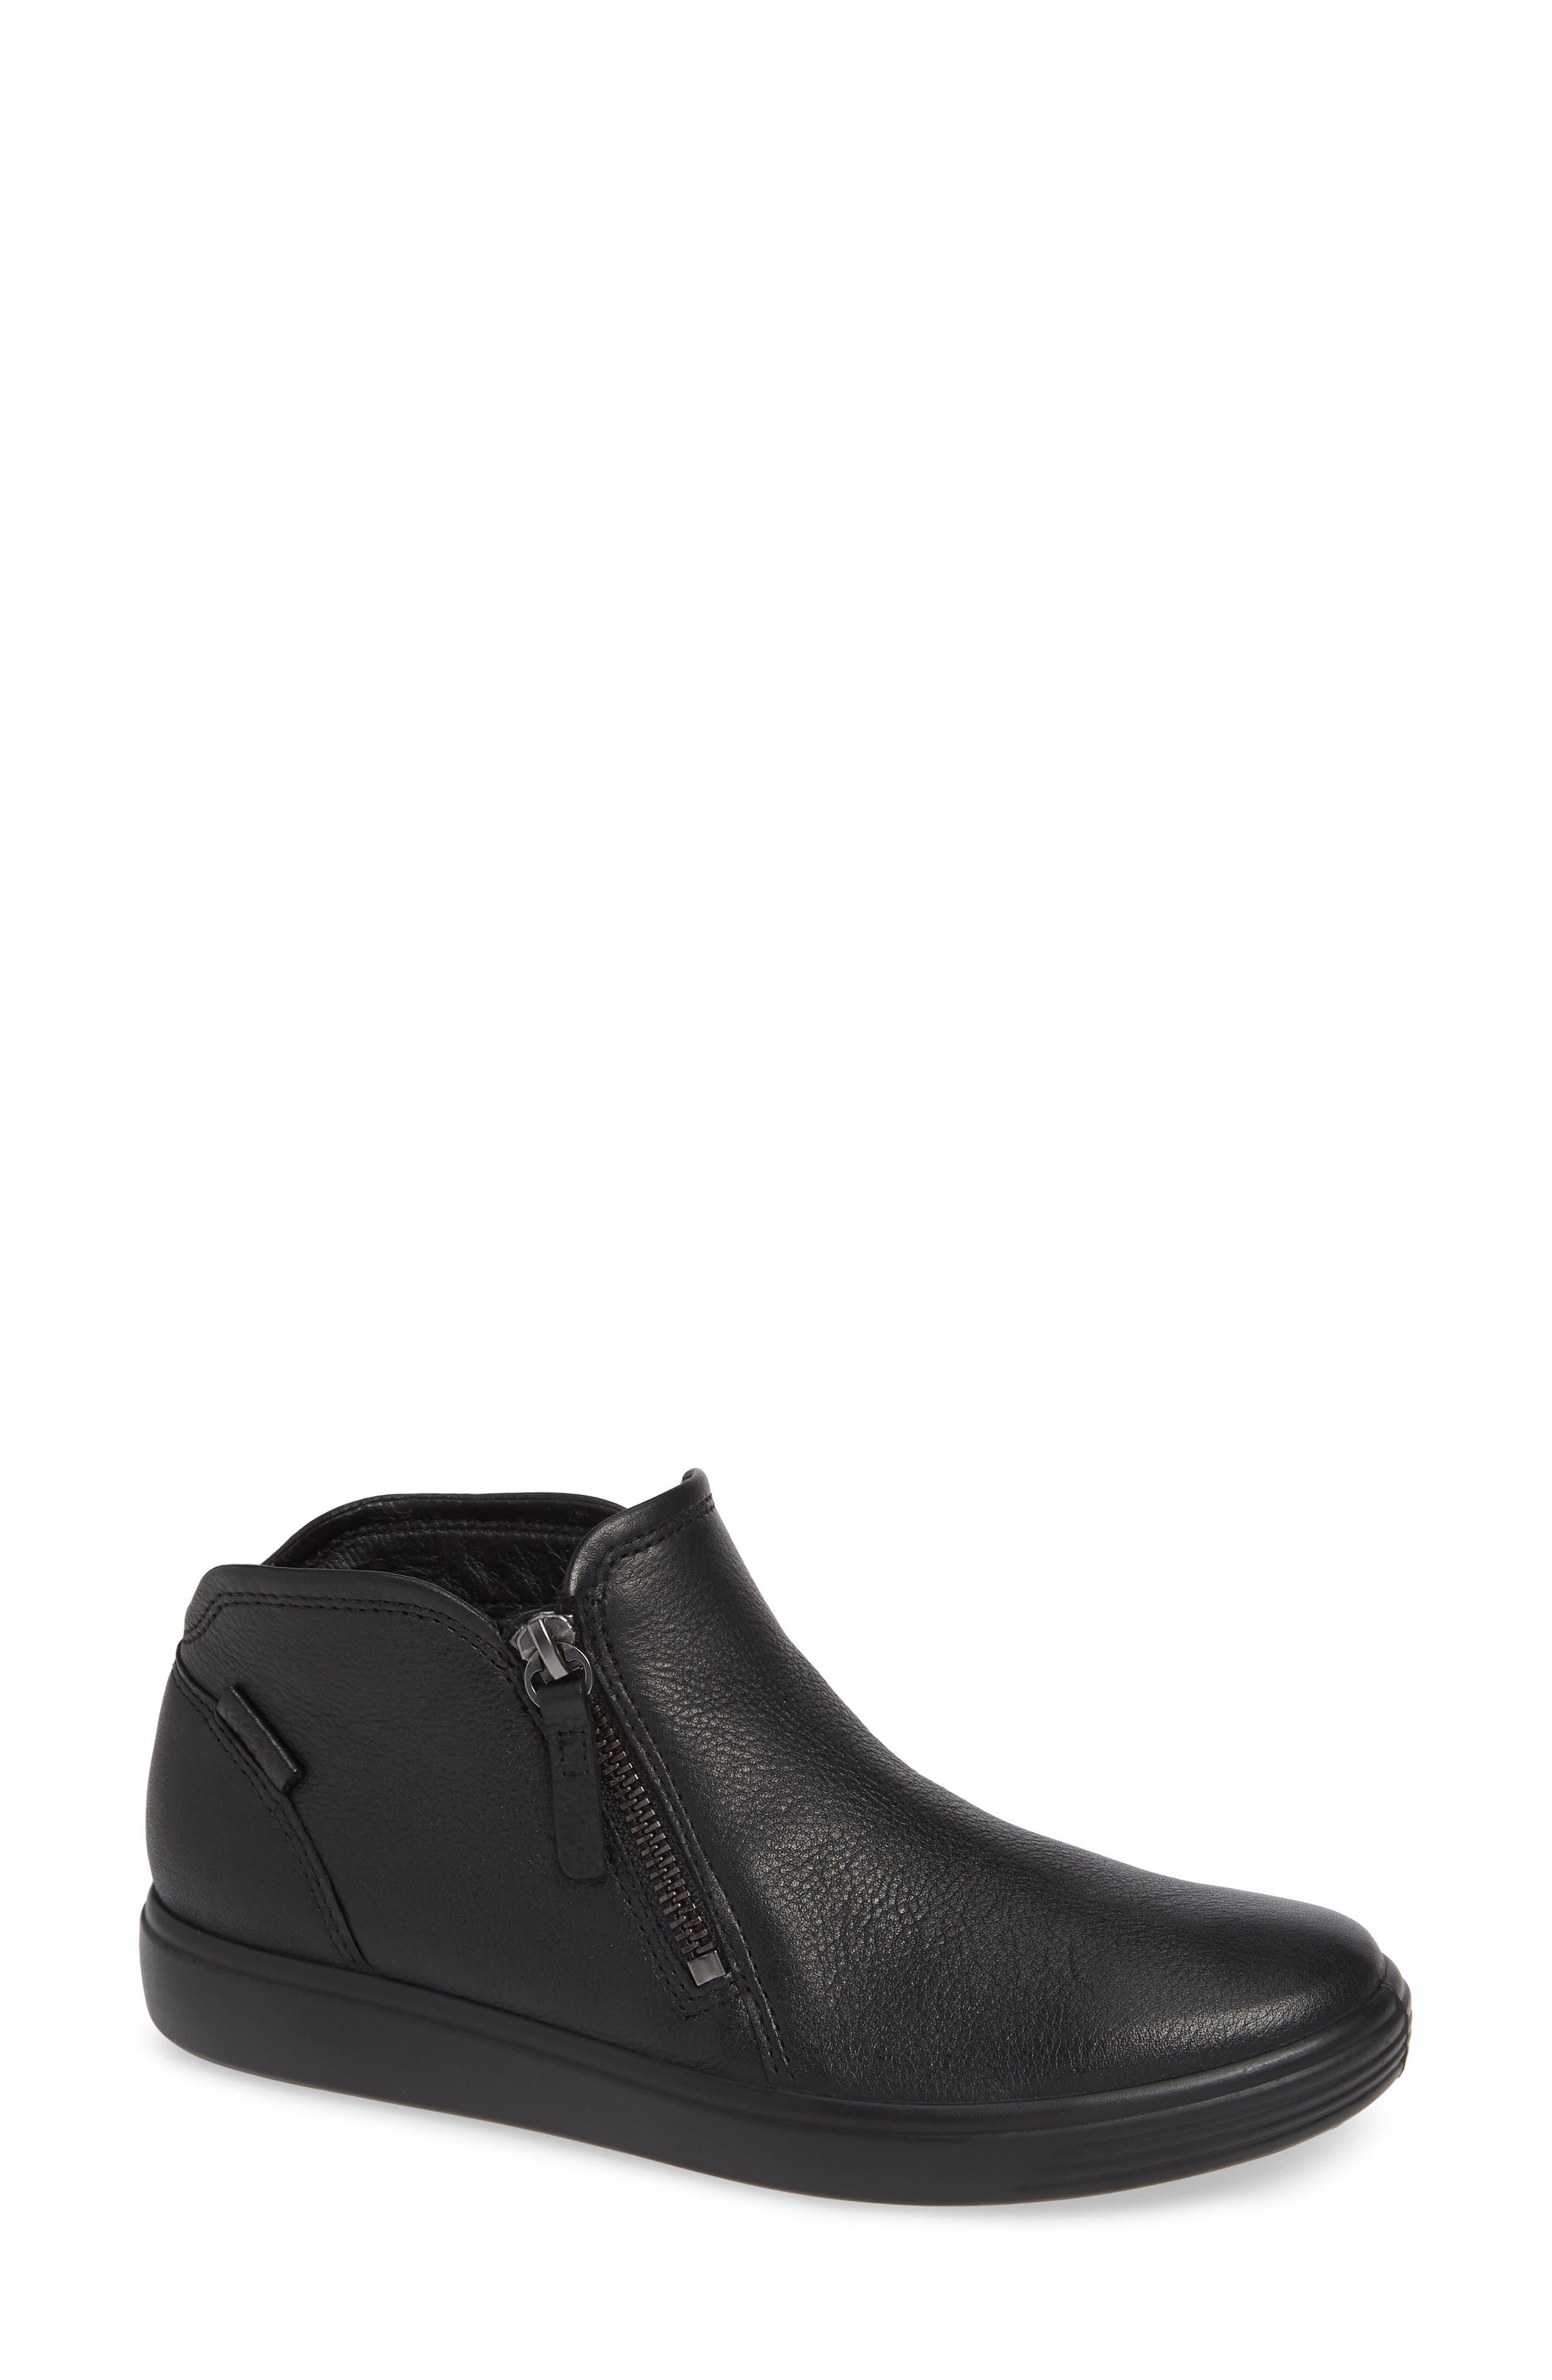 ECCO Soft 7 Mid Top Sneaker, Main, color, BLACK/ BLACK LEATHER